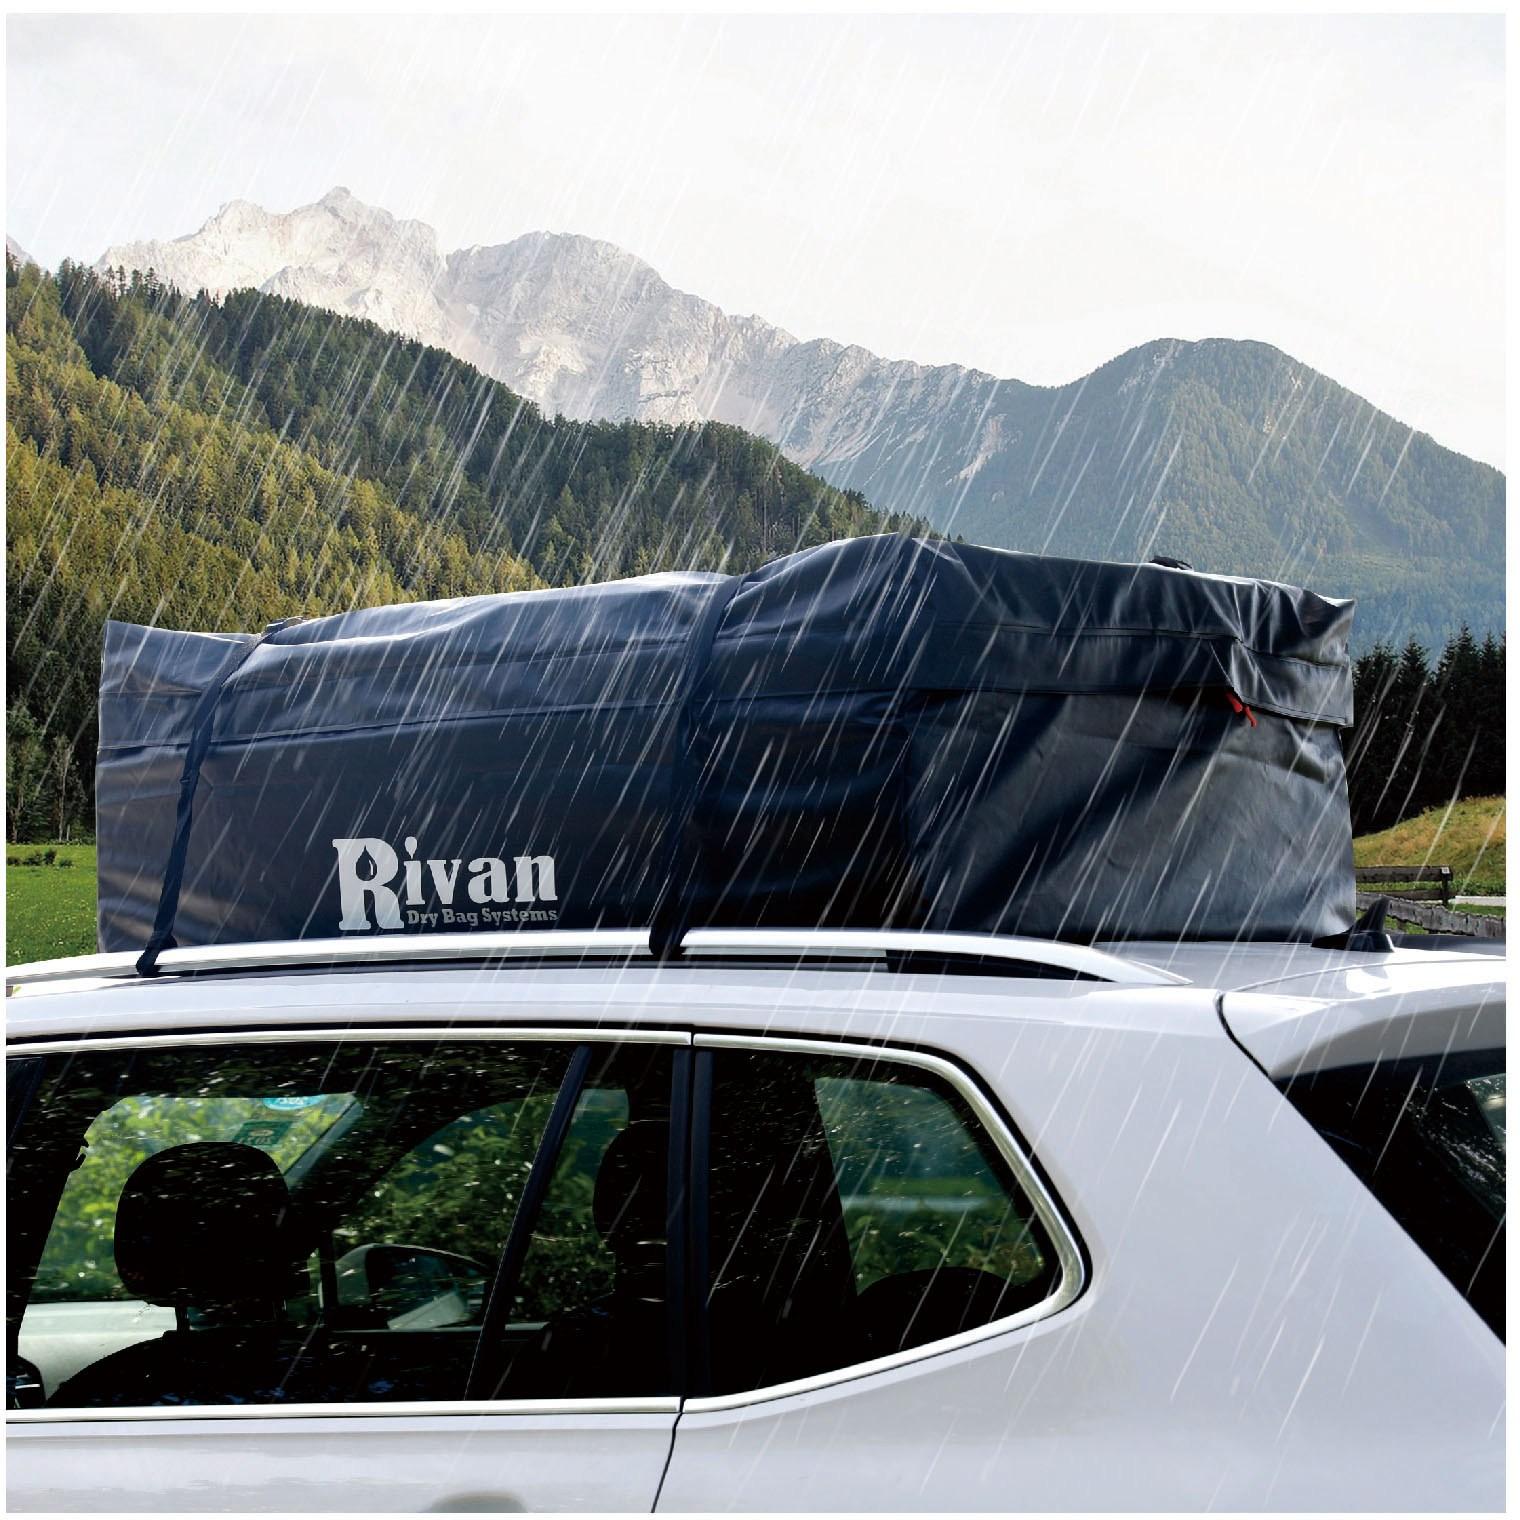 RIVAN 접이식 방수 루프박스 루프백 424L 짐승용량